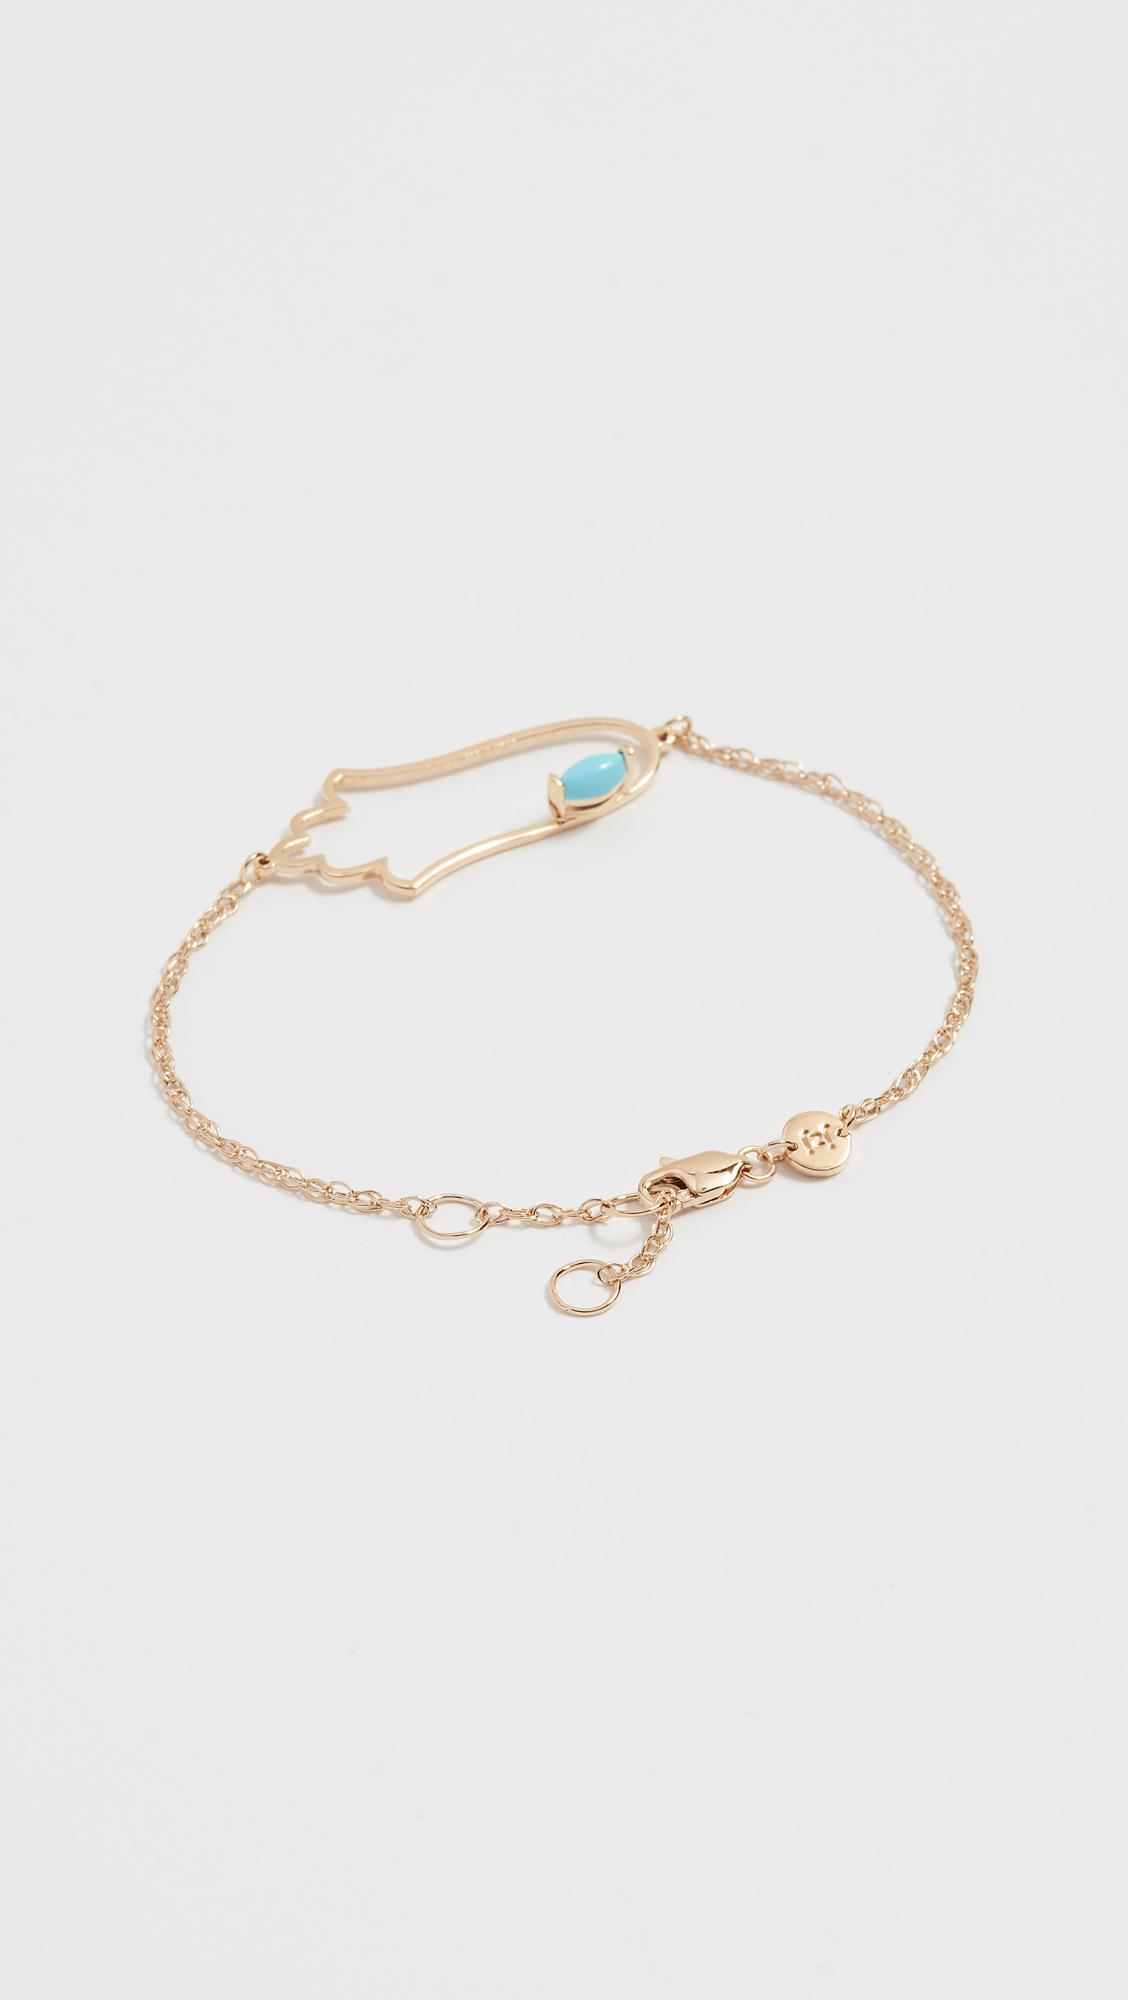 Jennifer Zeuner Open Hamsa Bracelet with Turquoise JOMLZf